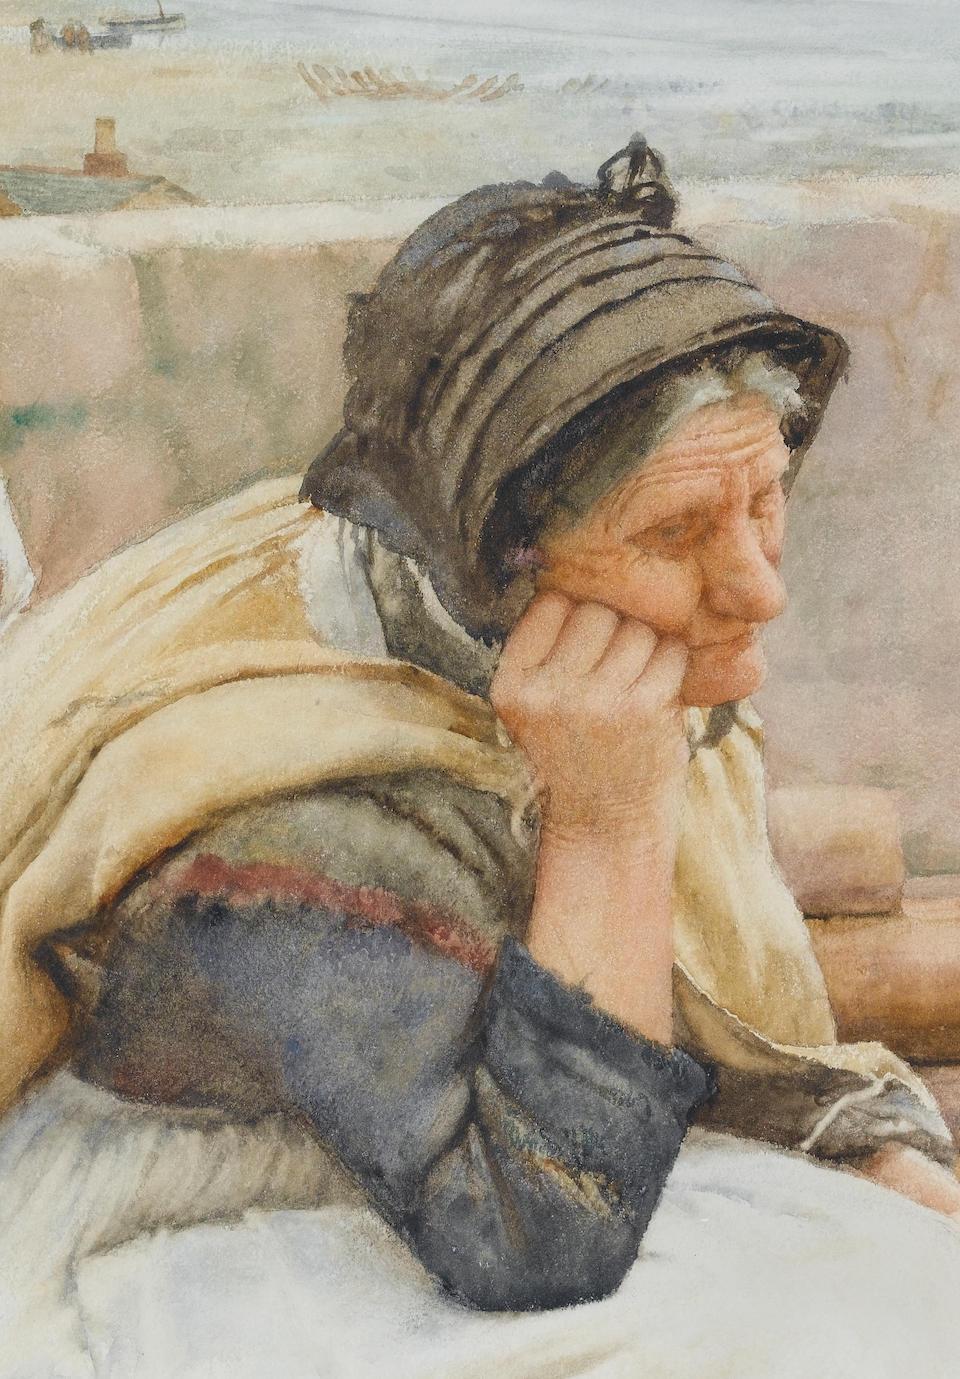 Walter Langley, RI (British, 1852-1922) A Village Idyll 75 x 120.5 cm. (29 1/2 x 47 1/2 in.)